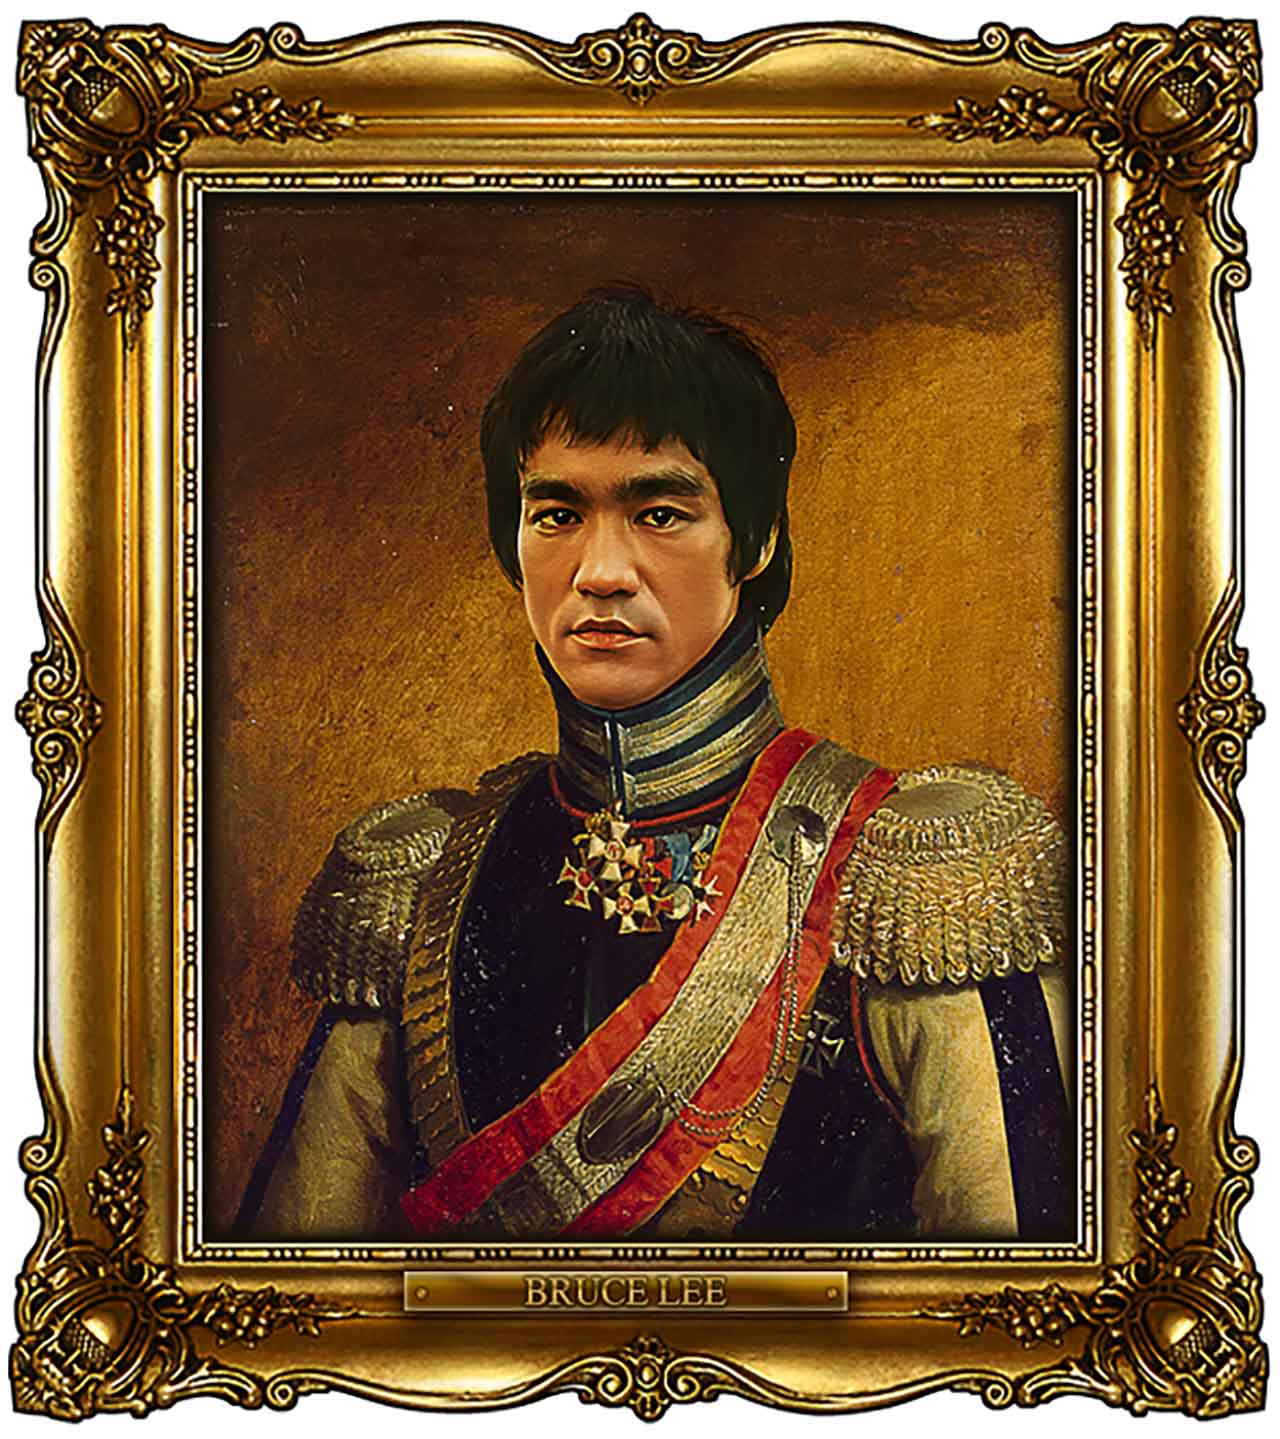 Artist Turns Famous Actors Into Russian Generals - Bruce Lee